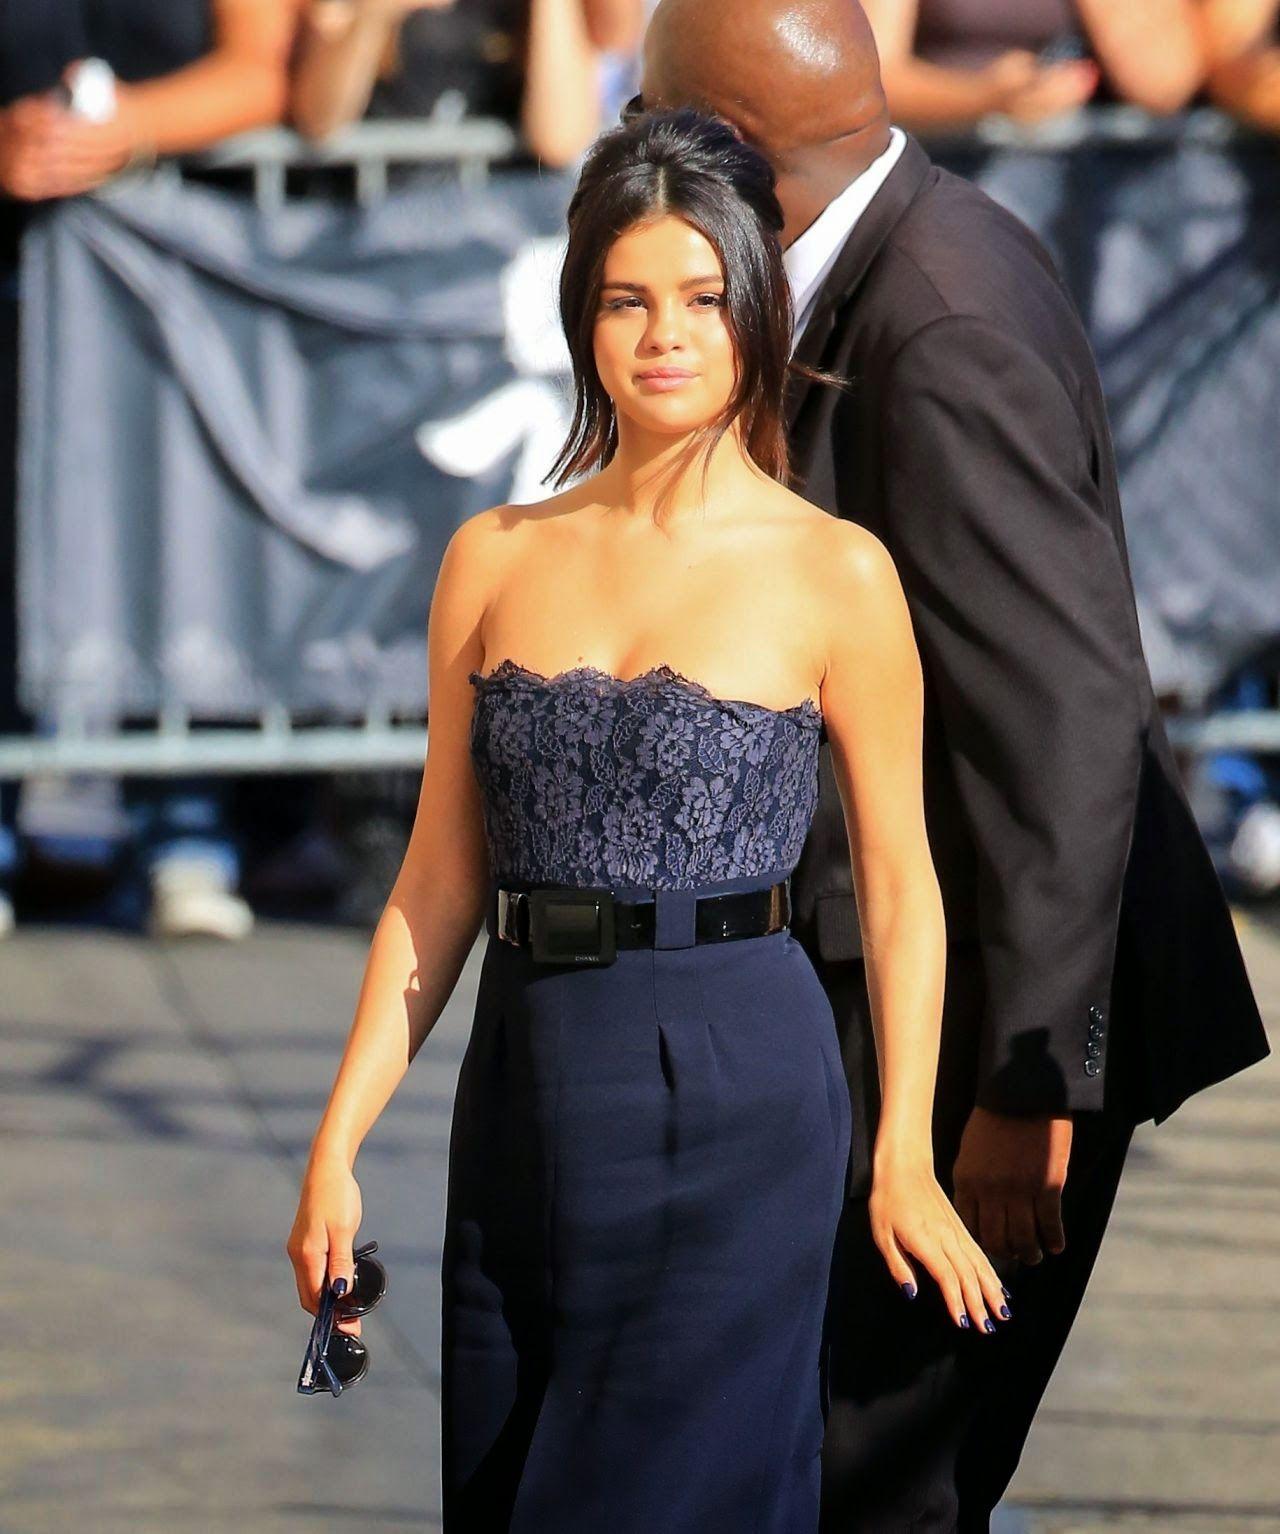 Selena Gomez arrives at Jimmy Kimmel Live in a strapless navy dress